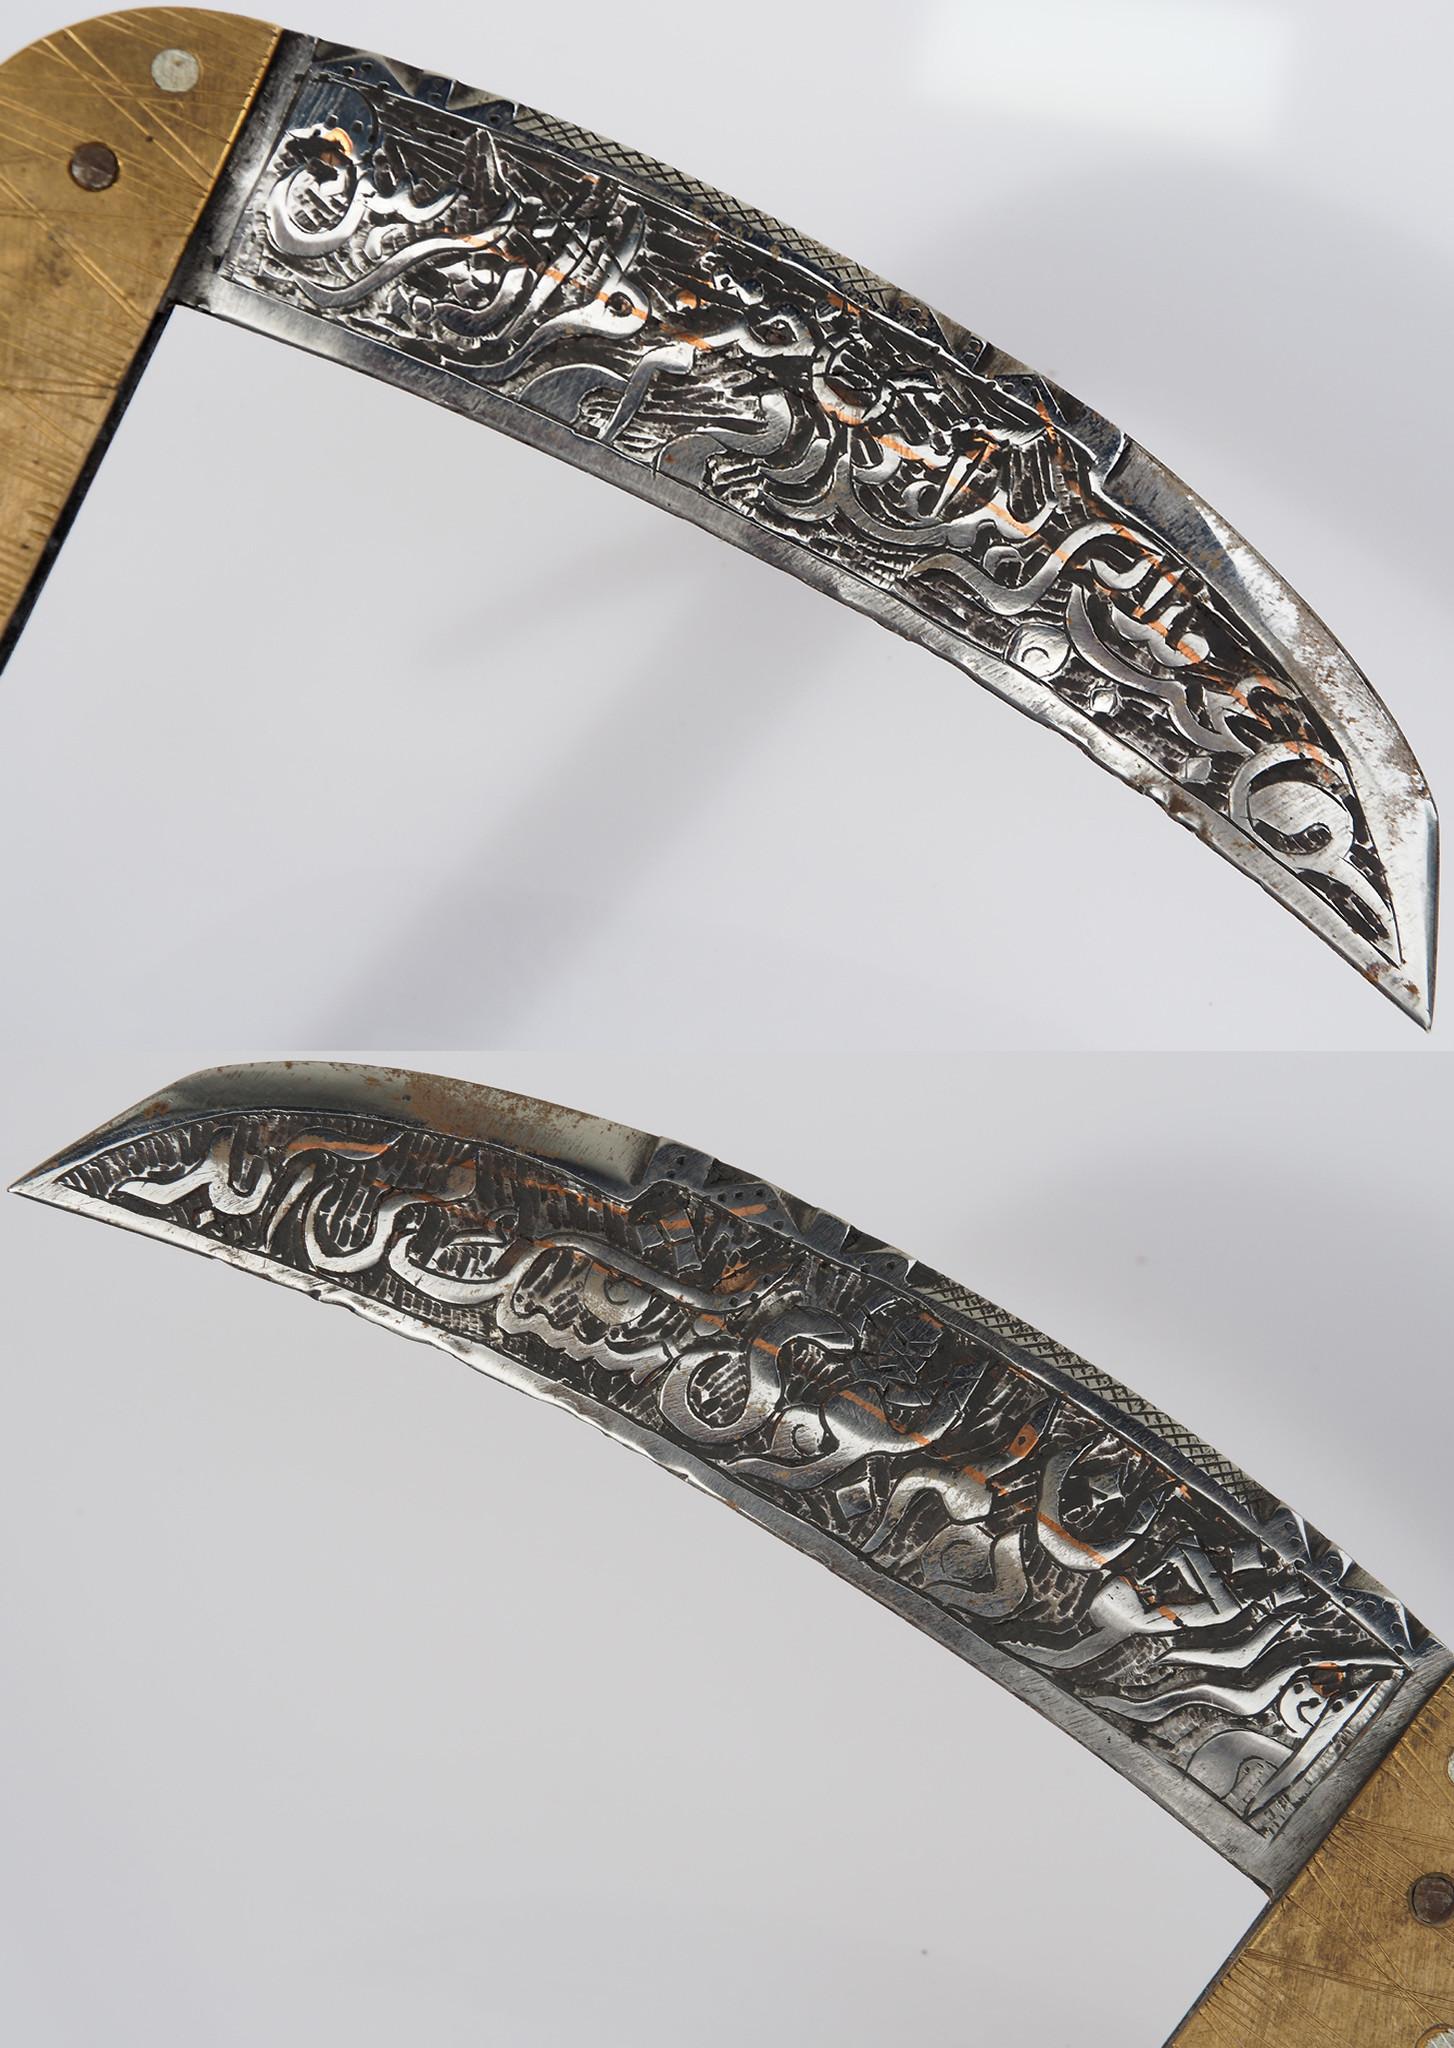 35 cm Knife Islamic scythe Short sword Dagger choora Pesh kabze  lohar Knife Khyber sickle Pick lapis  handle afghanistan pakistan :21F